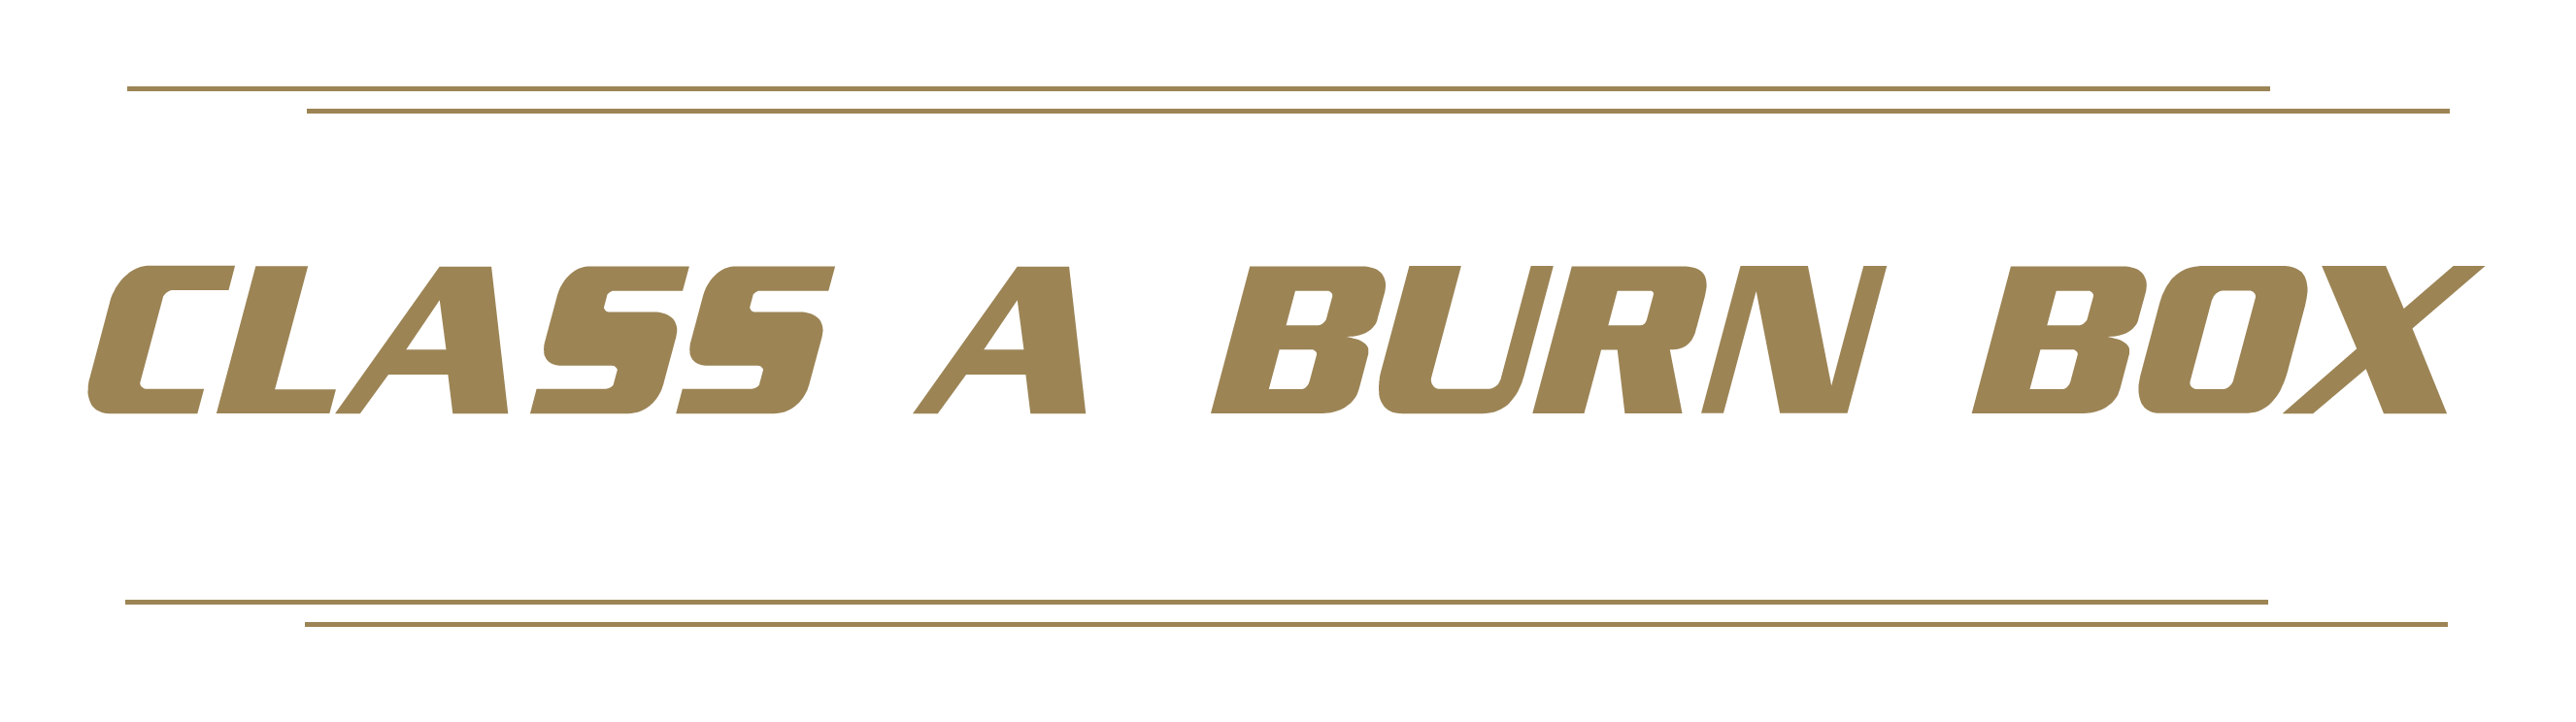 BurnBoxHeader